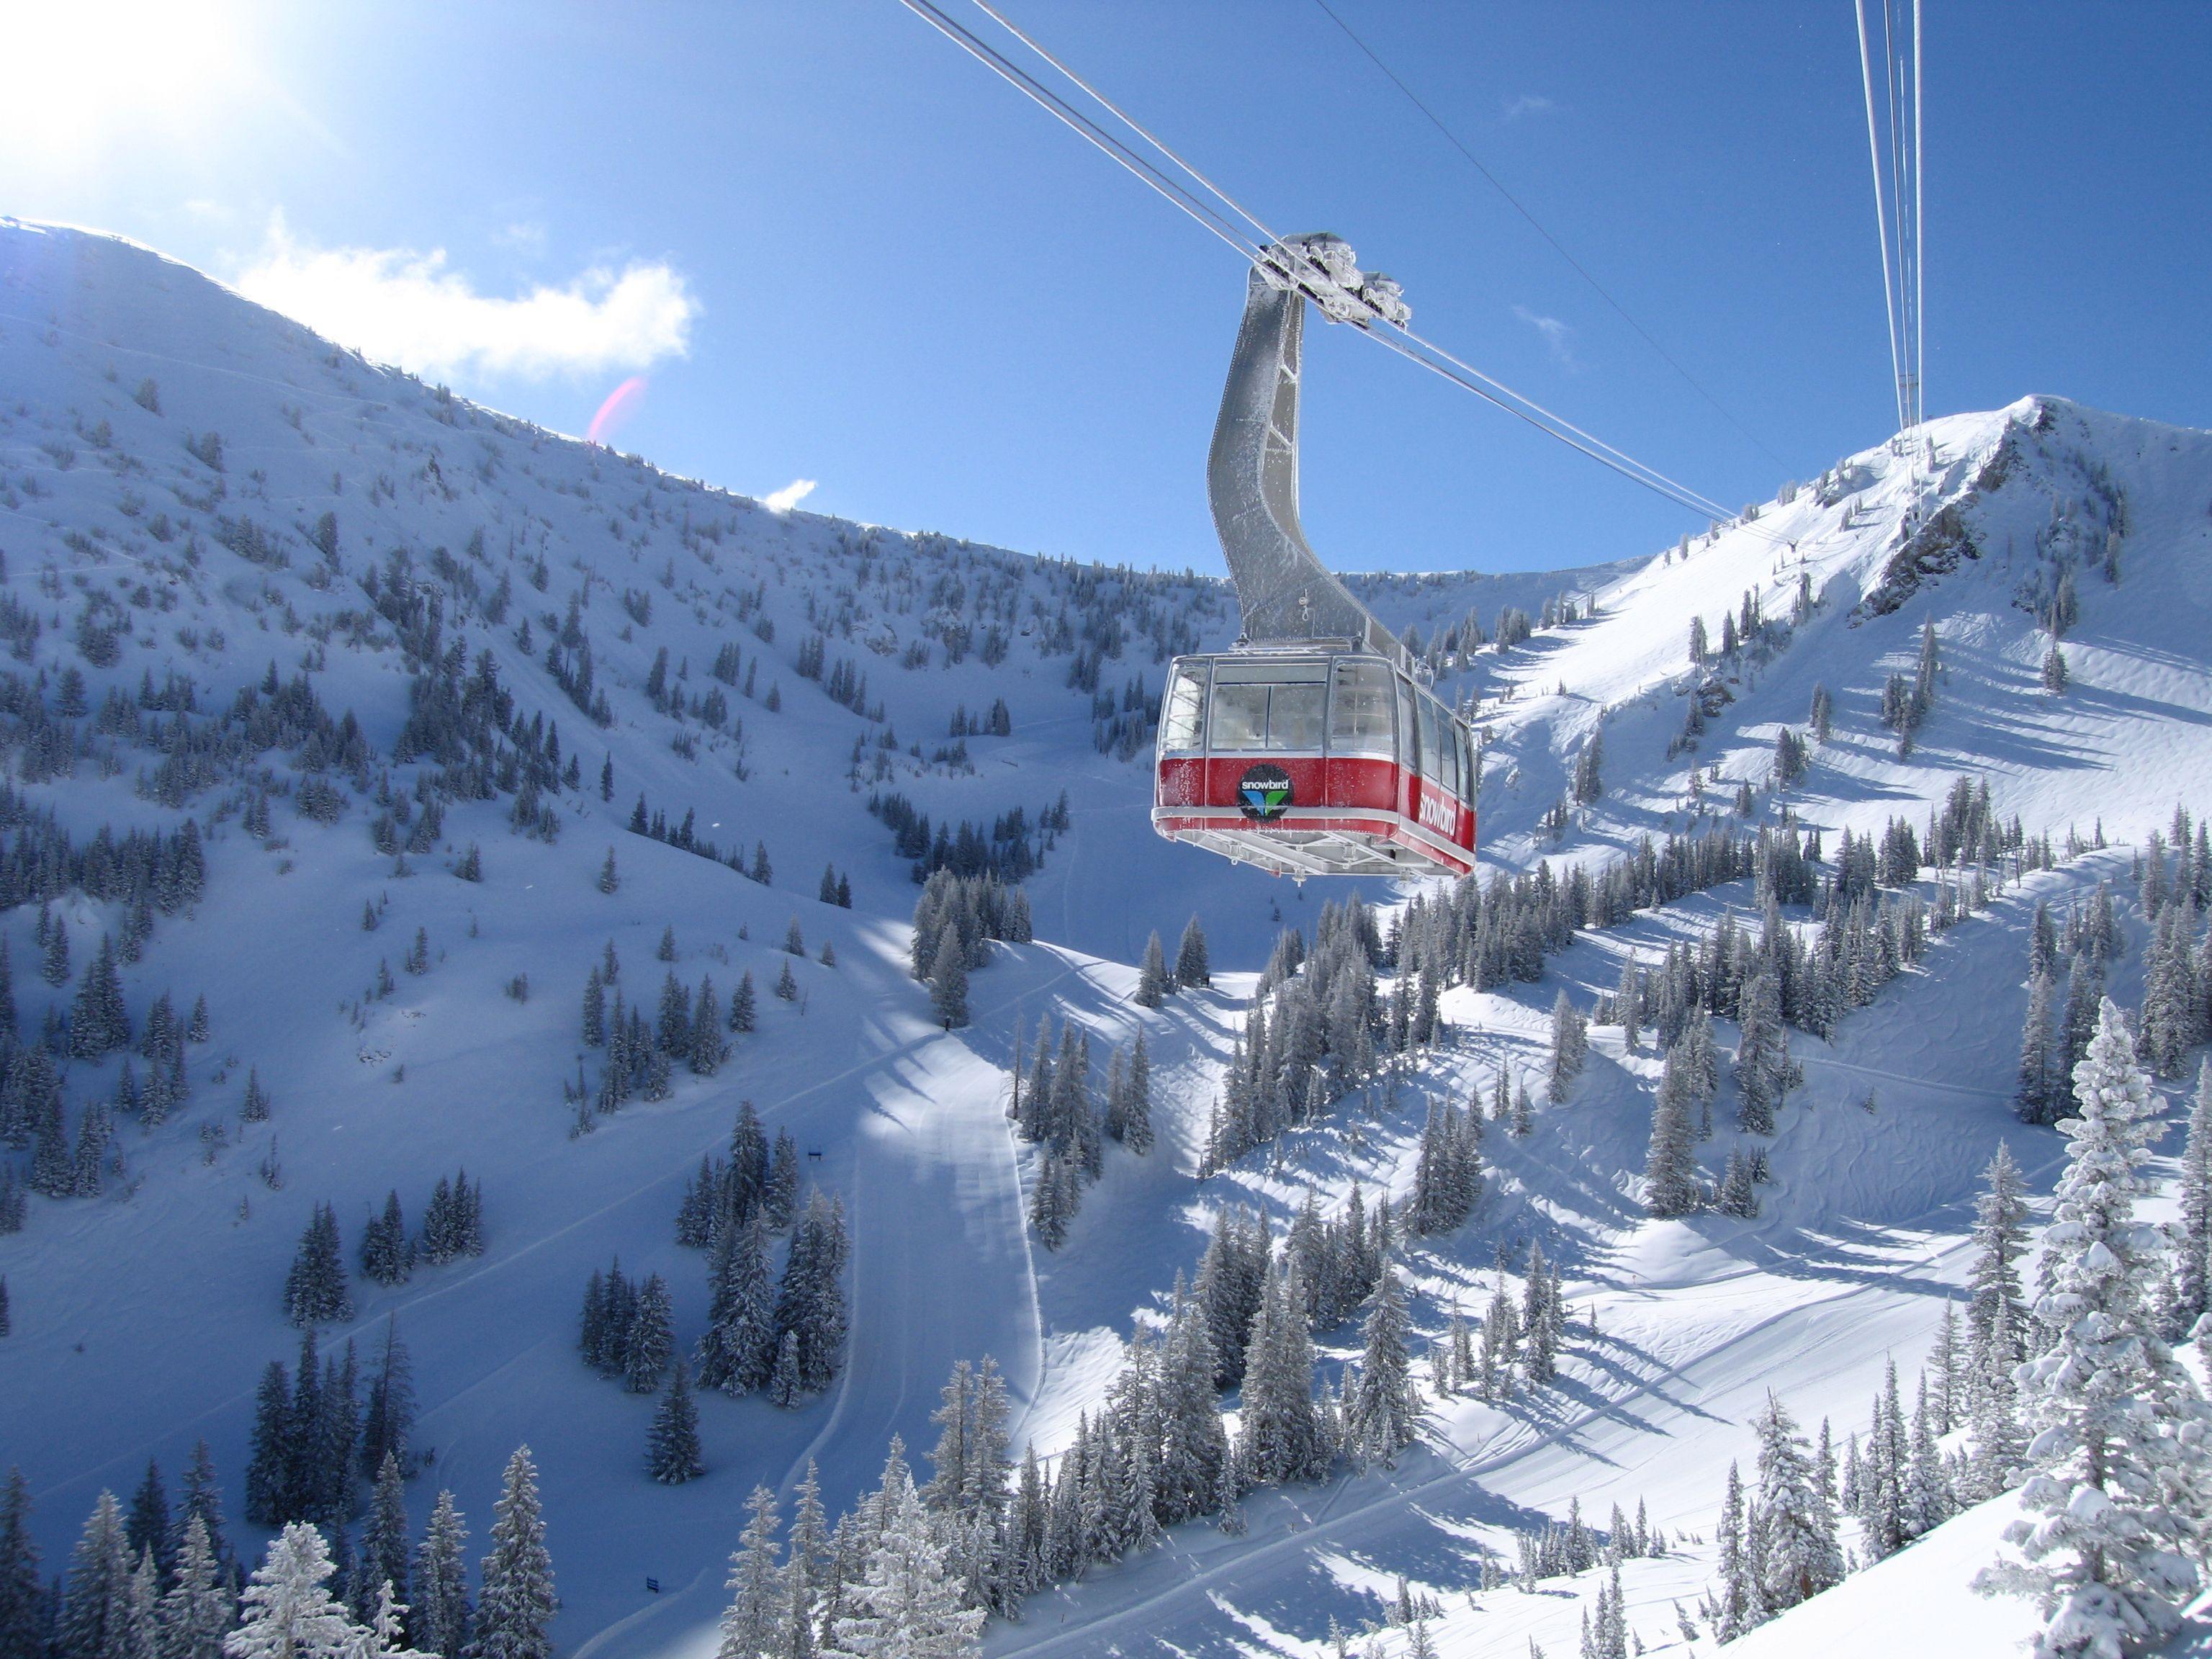 snowbird #utah - that champagne powder baby   destinations   skiing